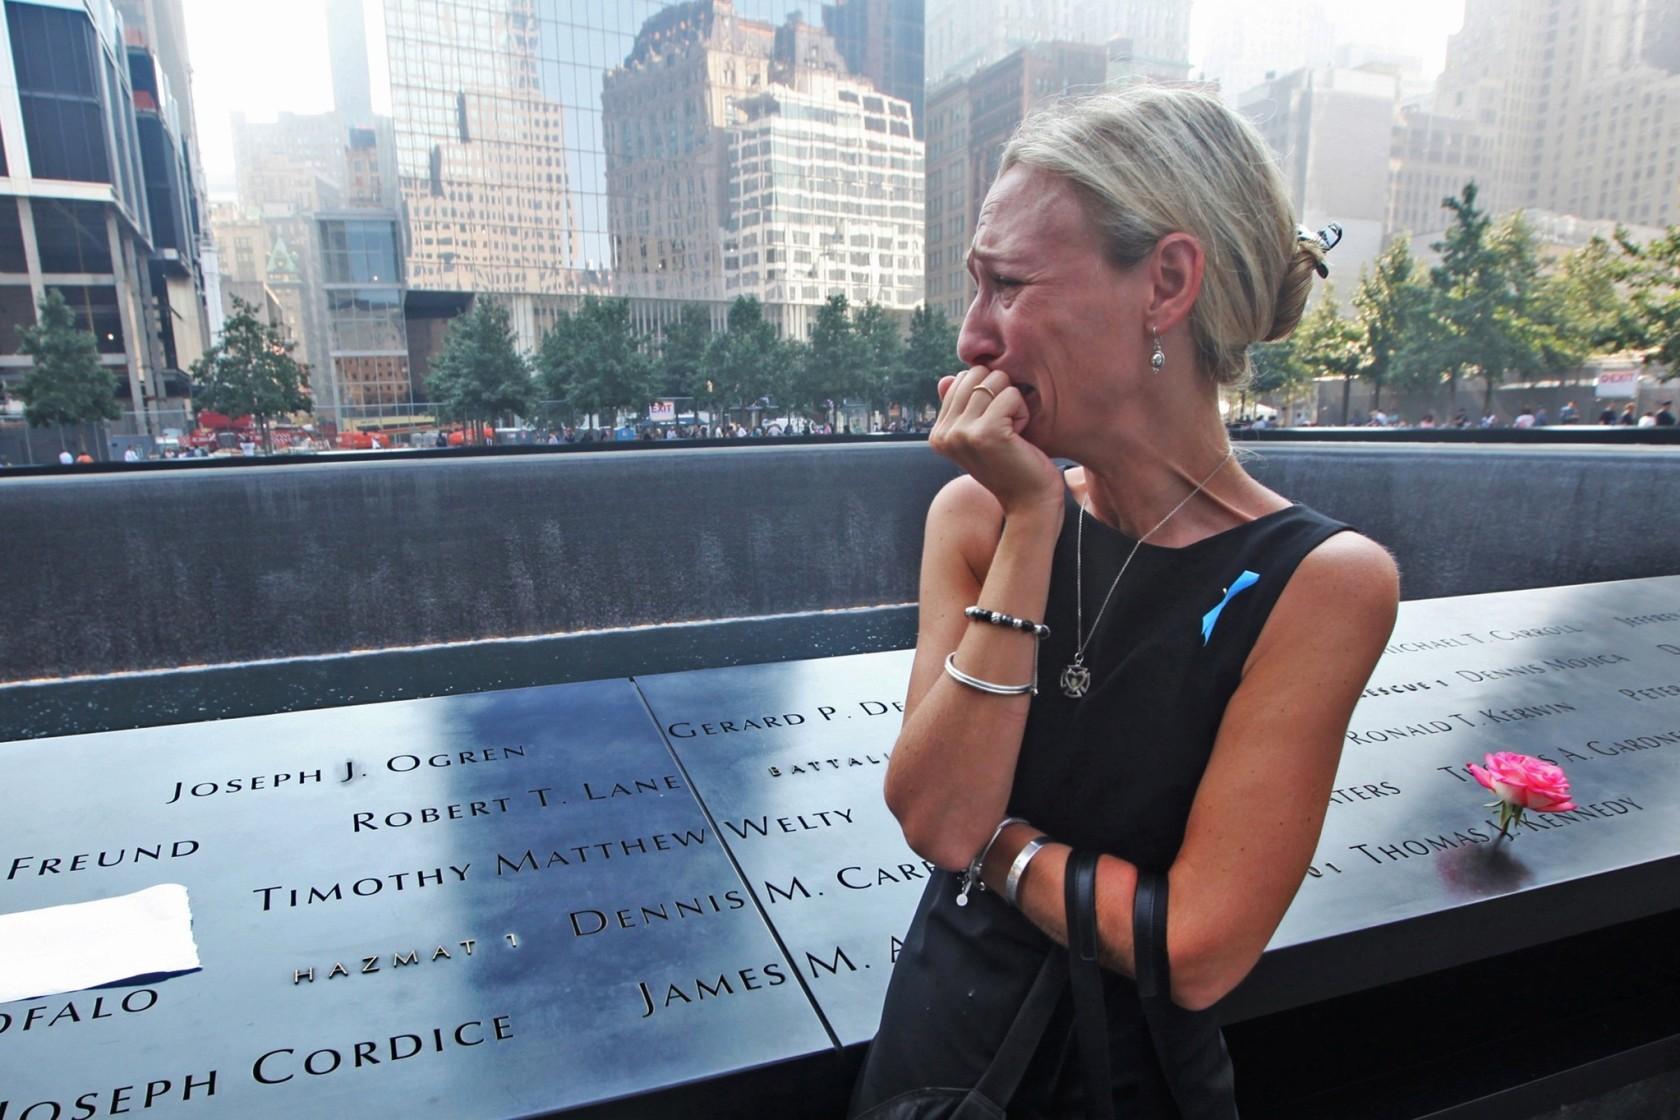 todays marks anniversary 9/11 attack